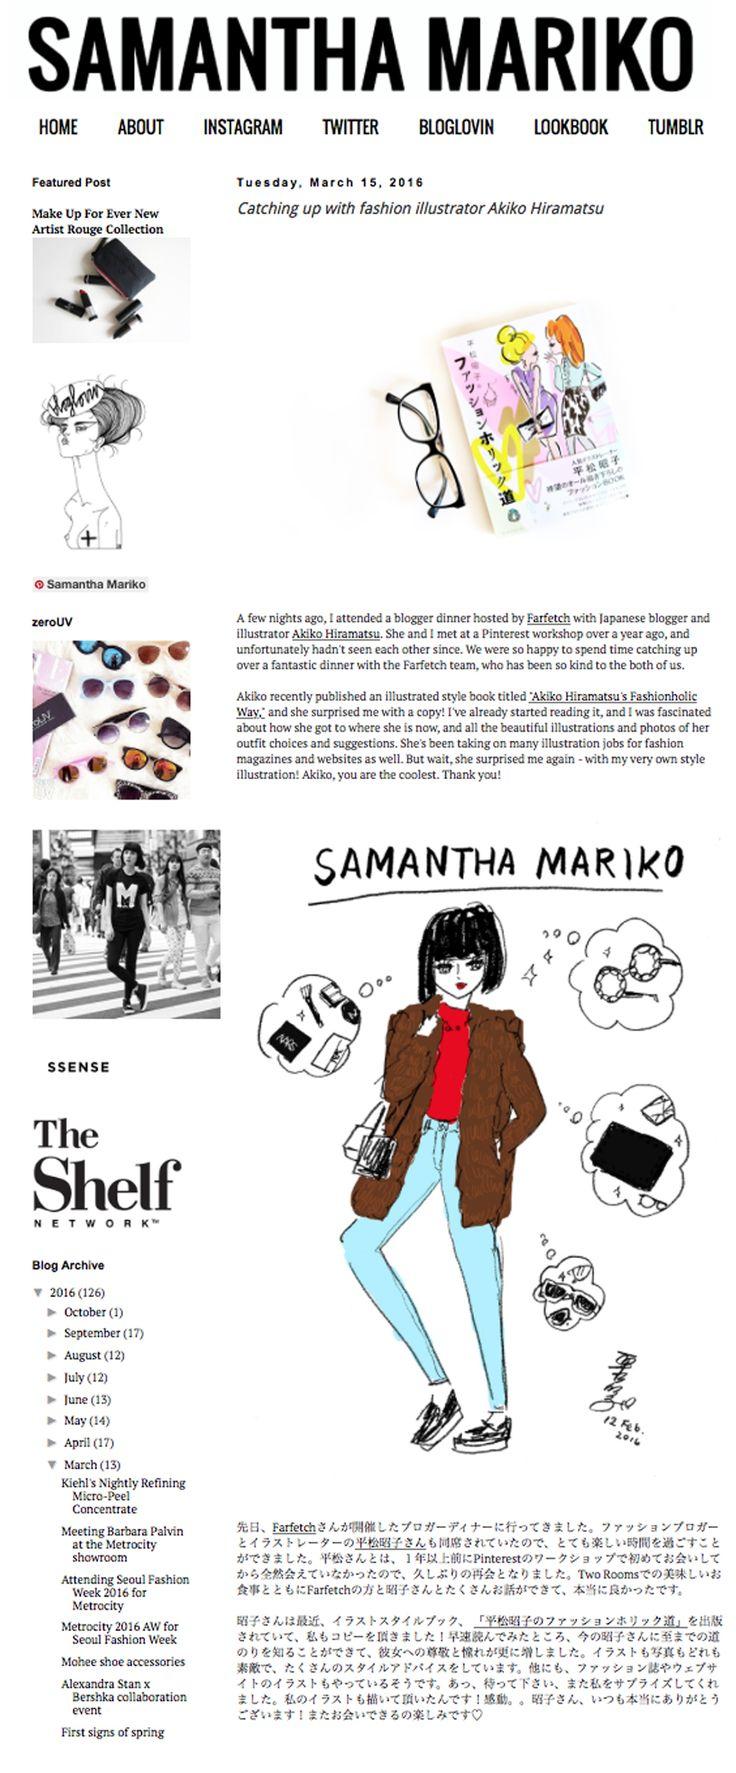 Samantha Mariko featured 'Fashion Holic Way' on her blog! I love her style very much! Thank you, Mariko san♡